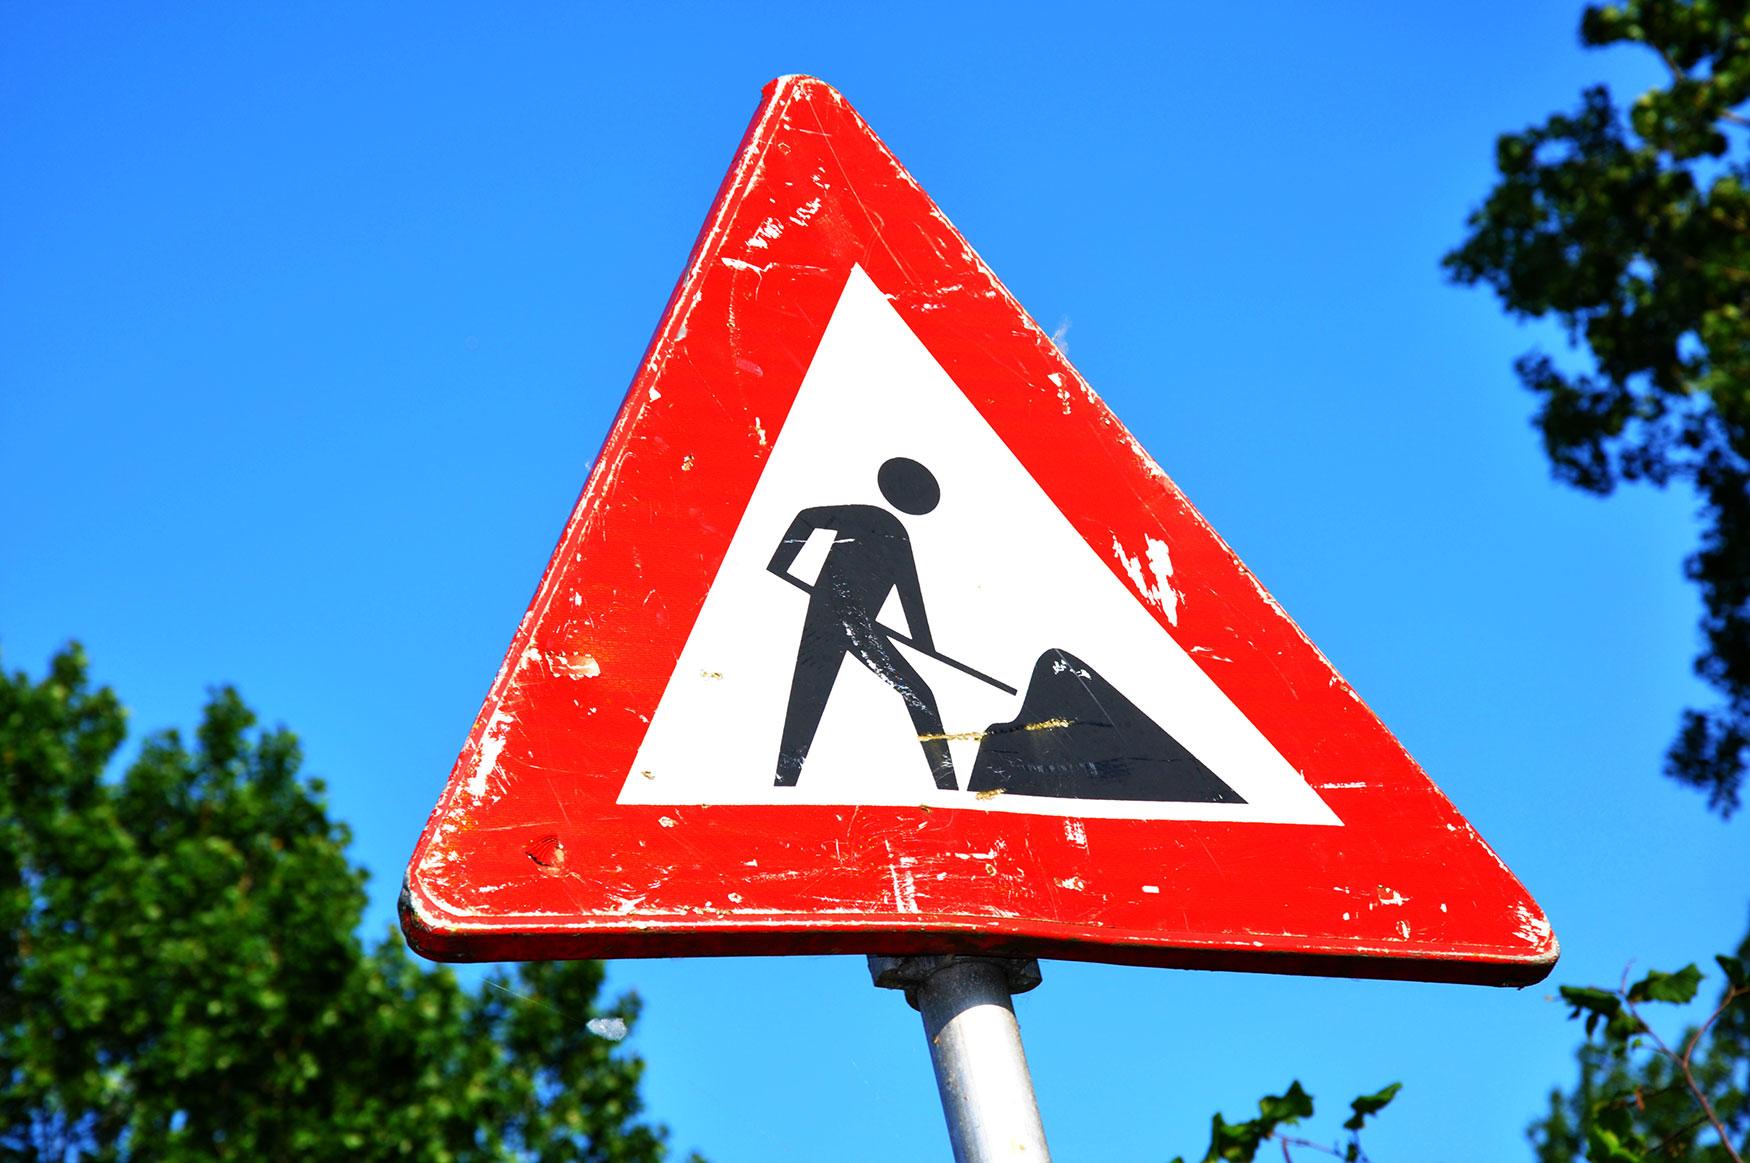 301 redirect detour sign